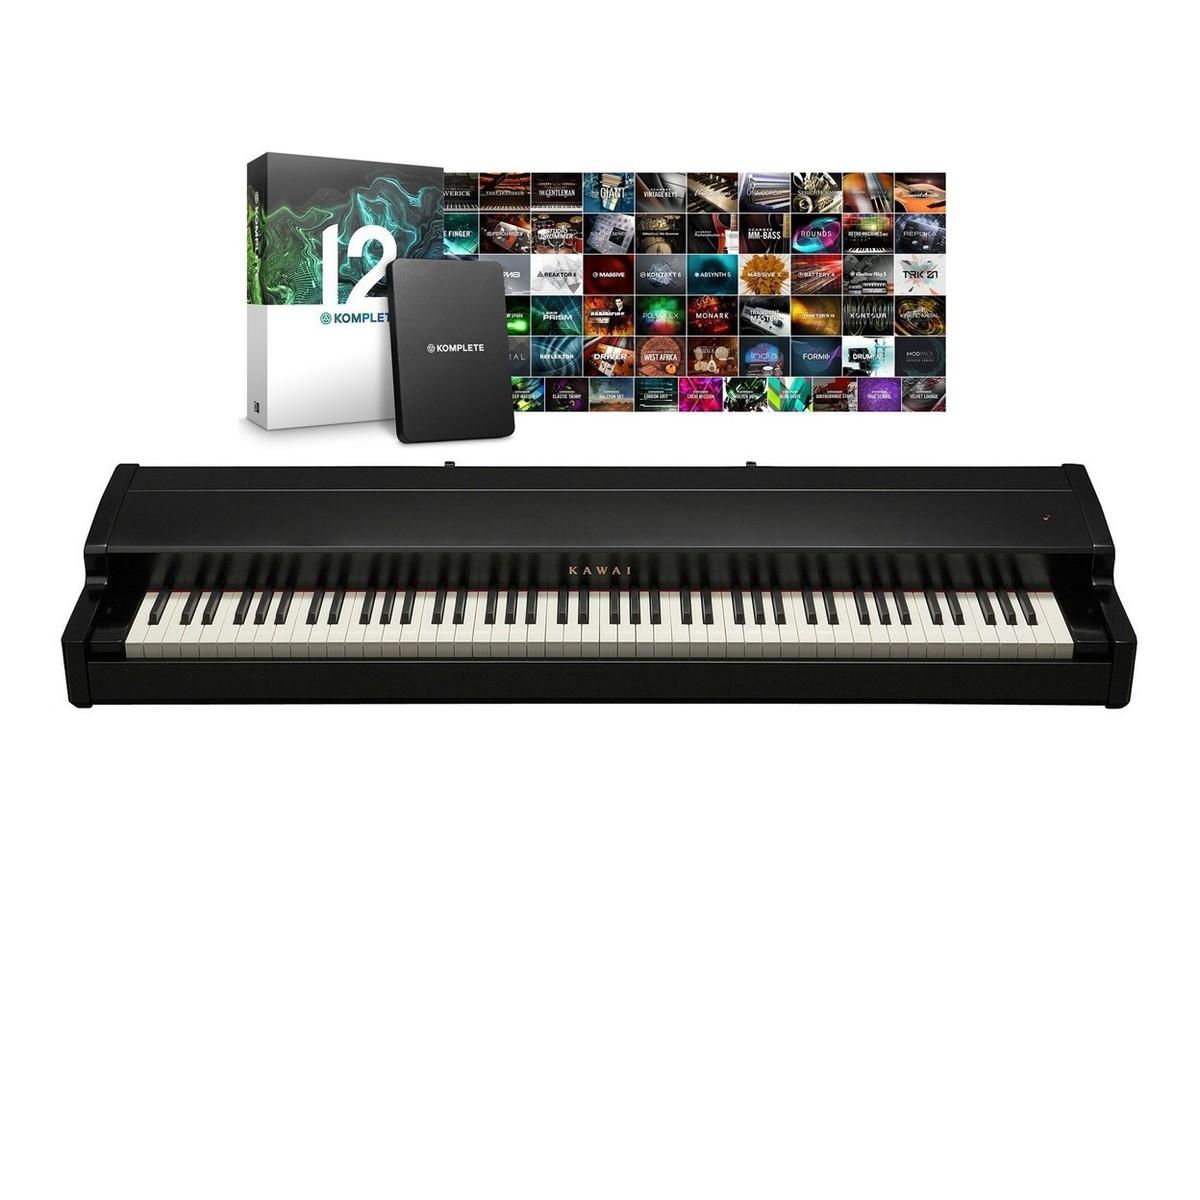 Kawai Vpc1 Virtual Piano Controller With Komplete 12